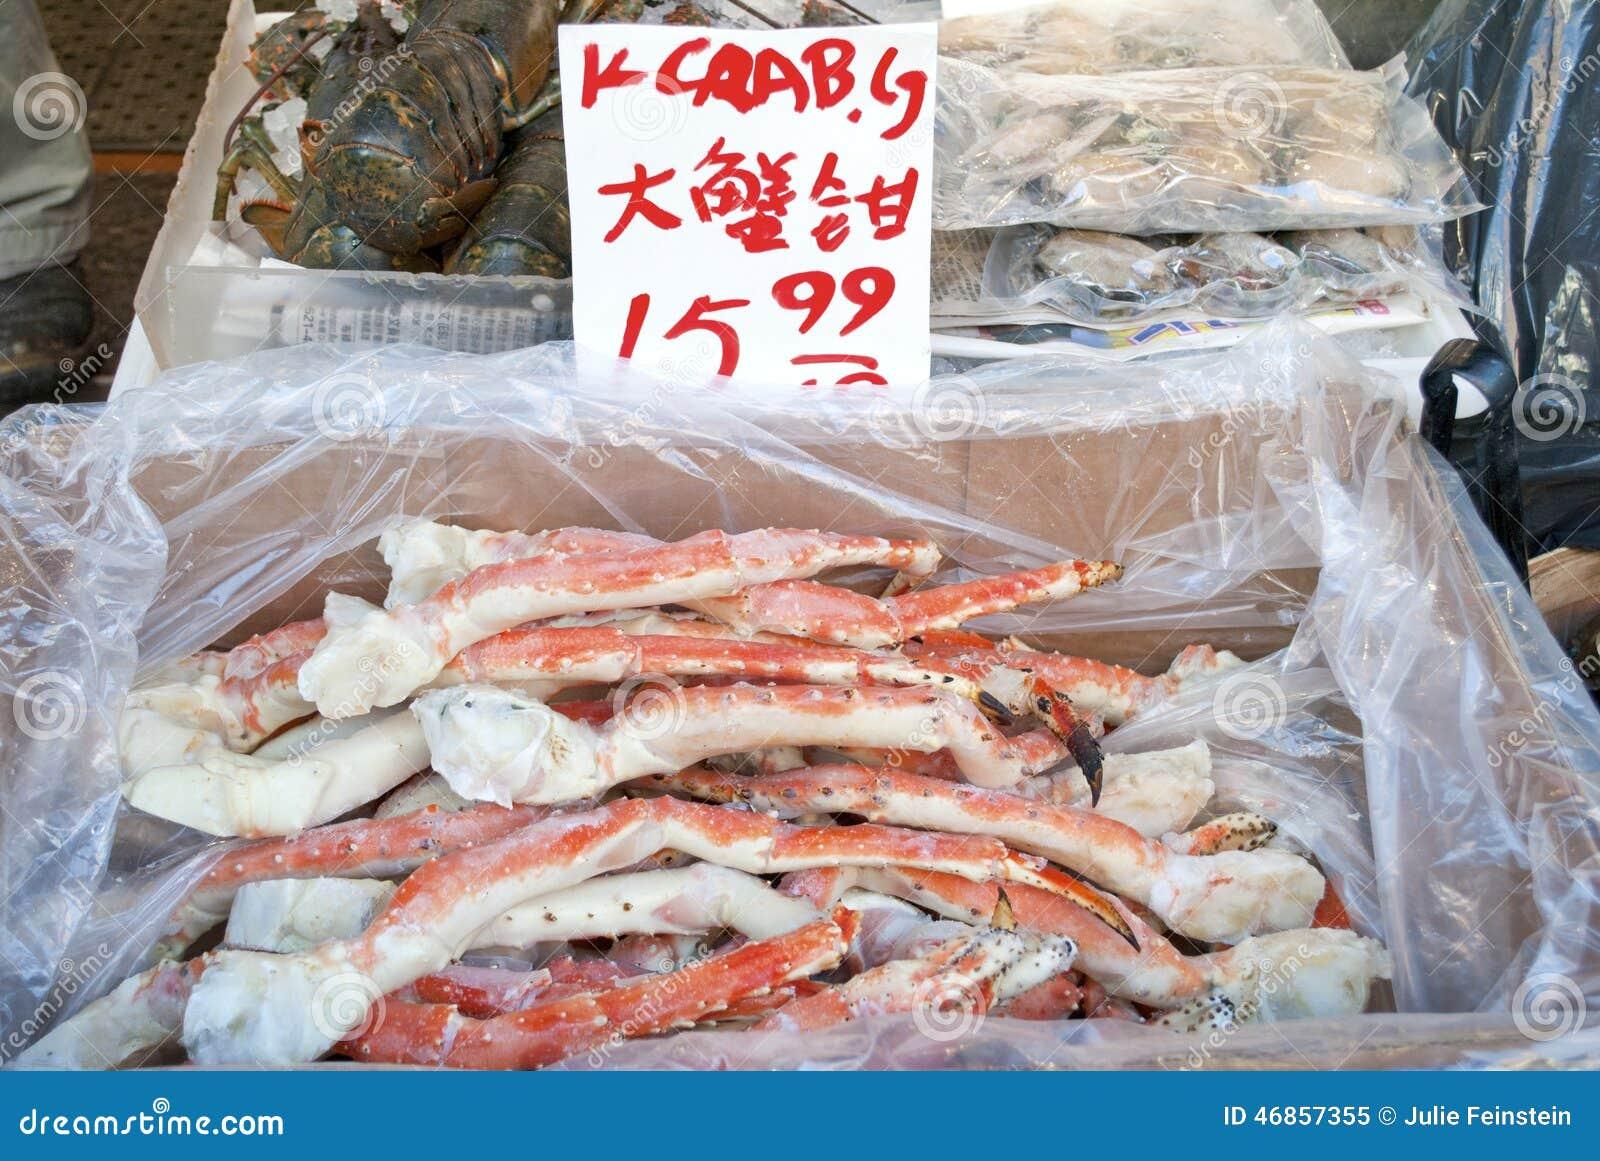 King Crab Legs stock image  Image of crab, crustaceans